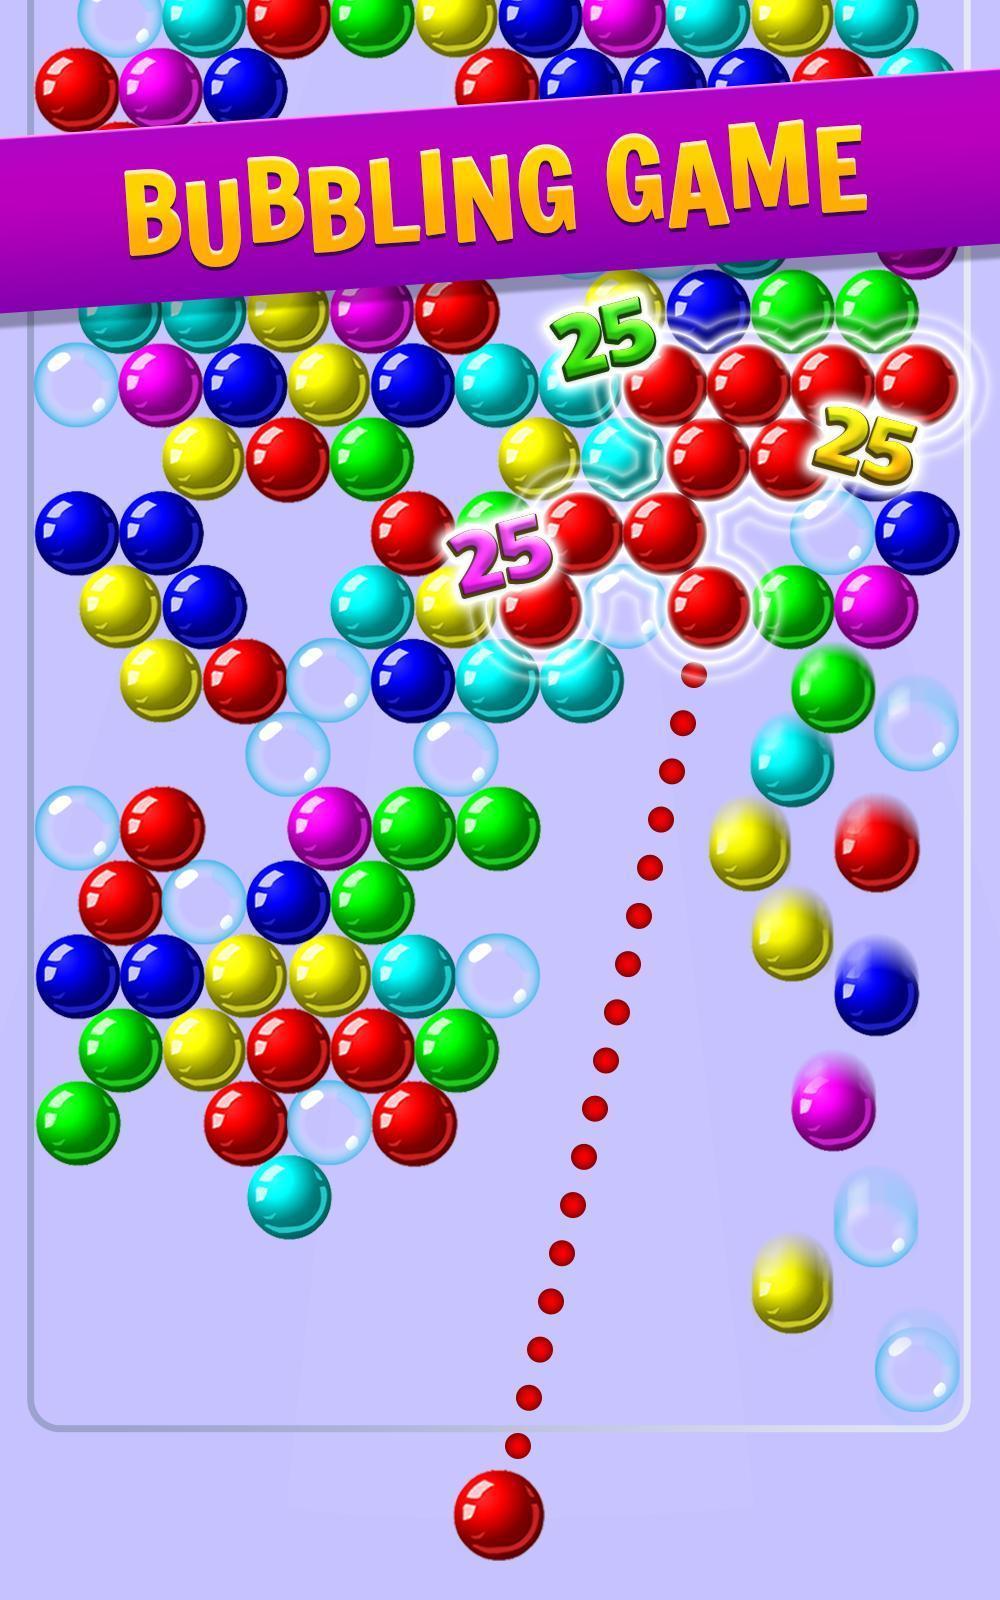 Bubble Shooters - Pop the bubbles 1.2.4 Screenshot 3